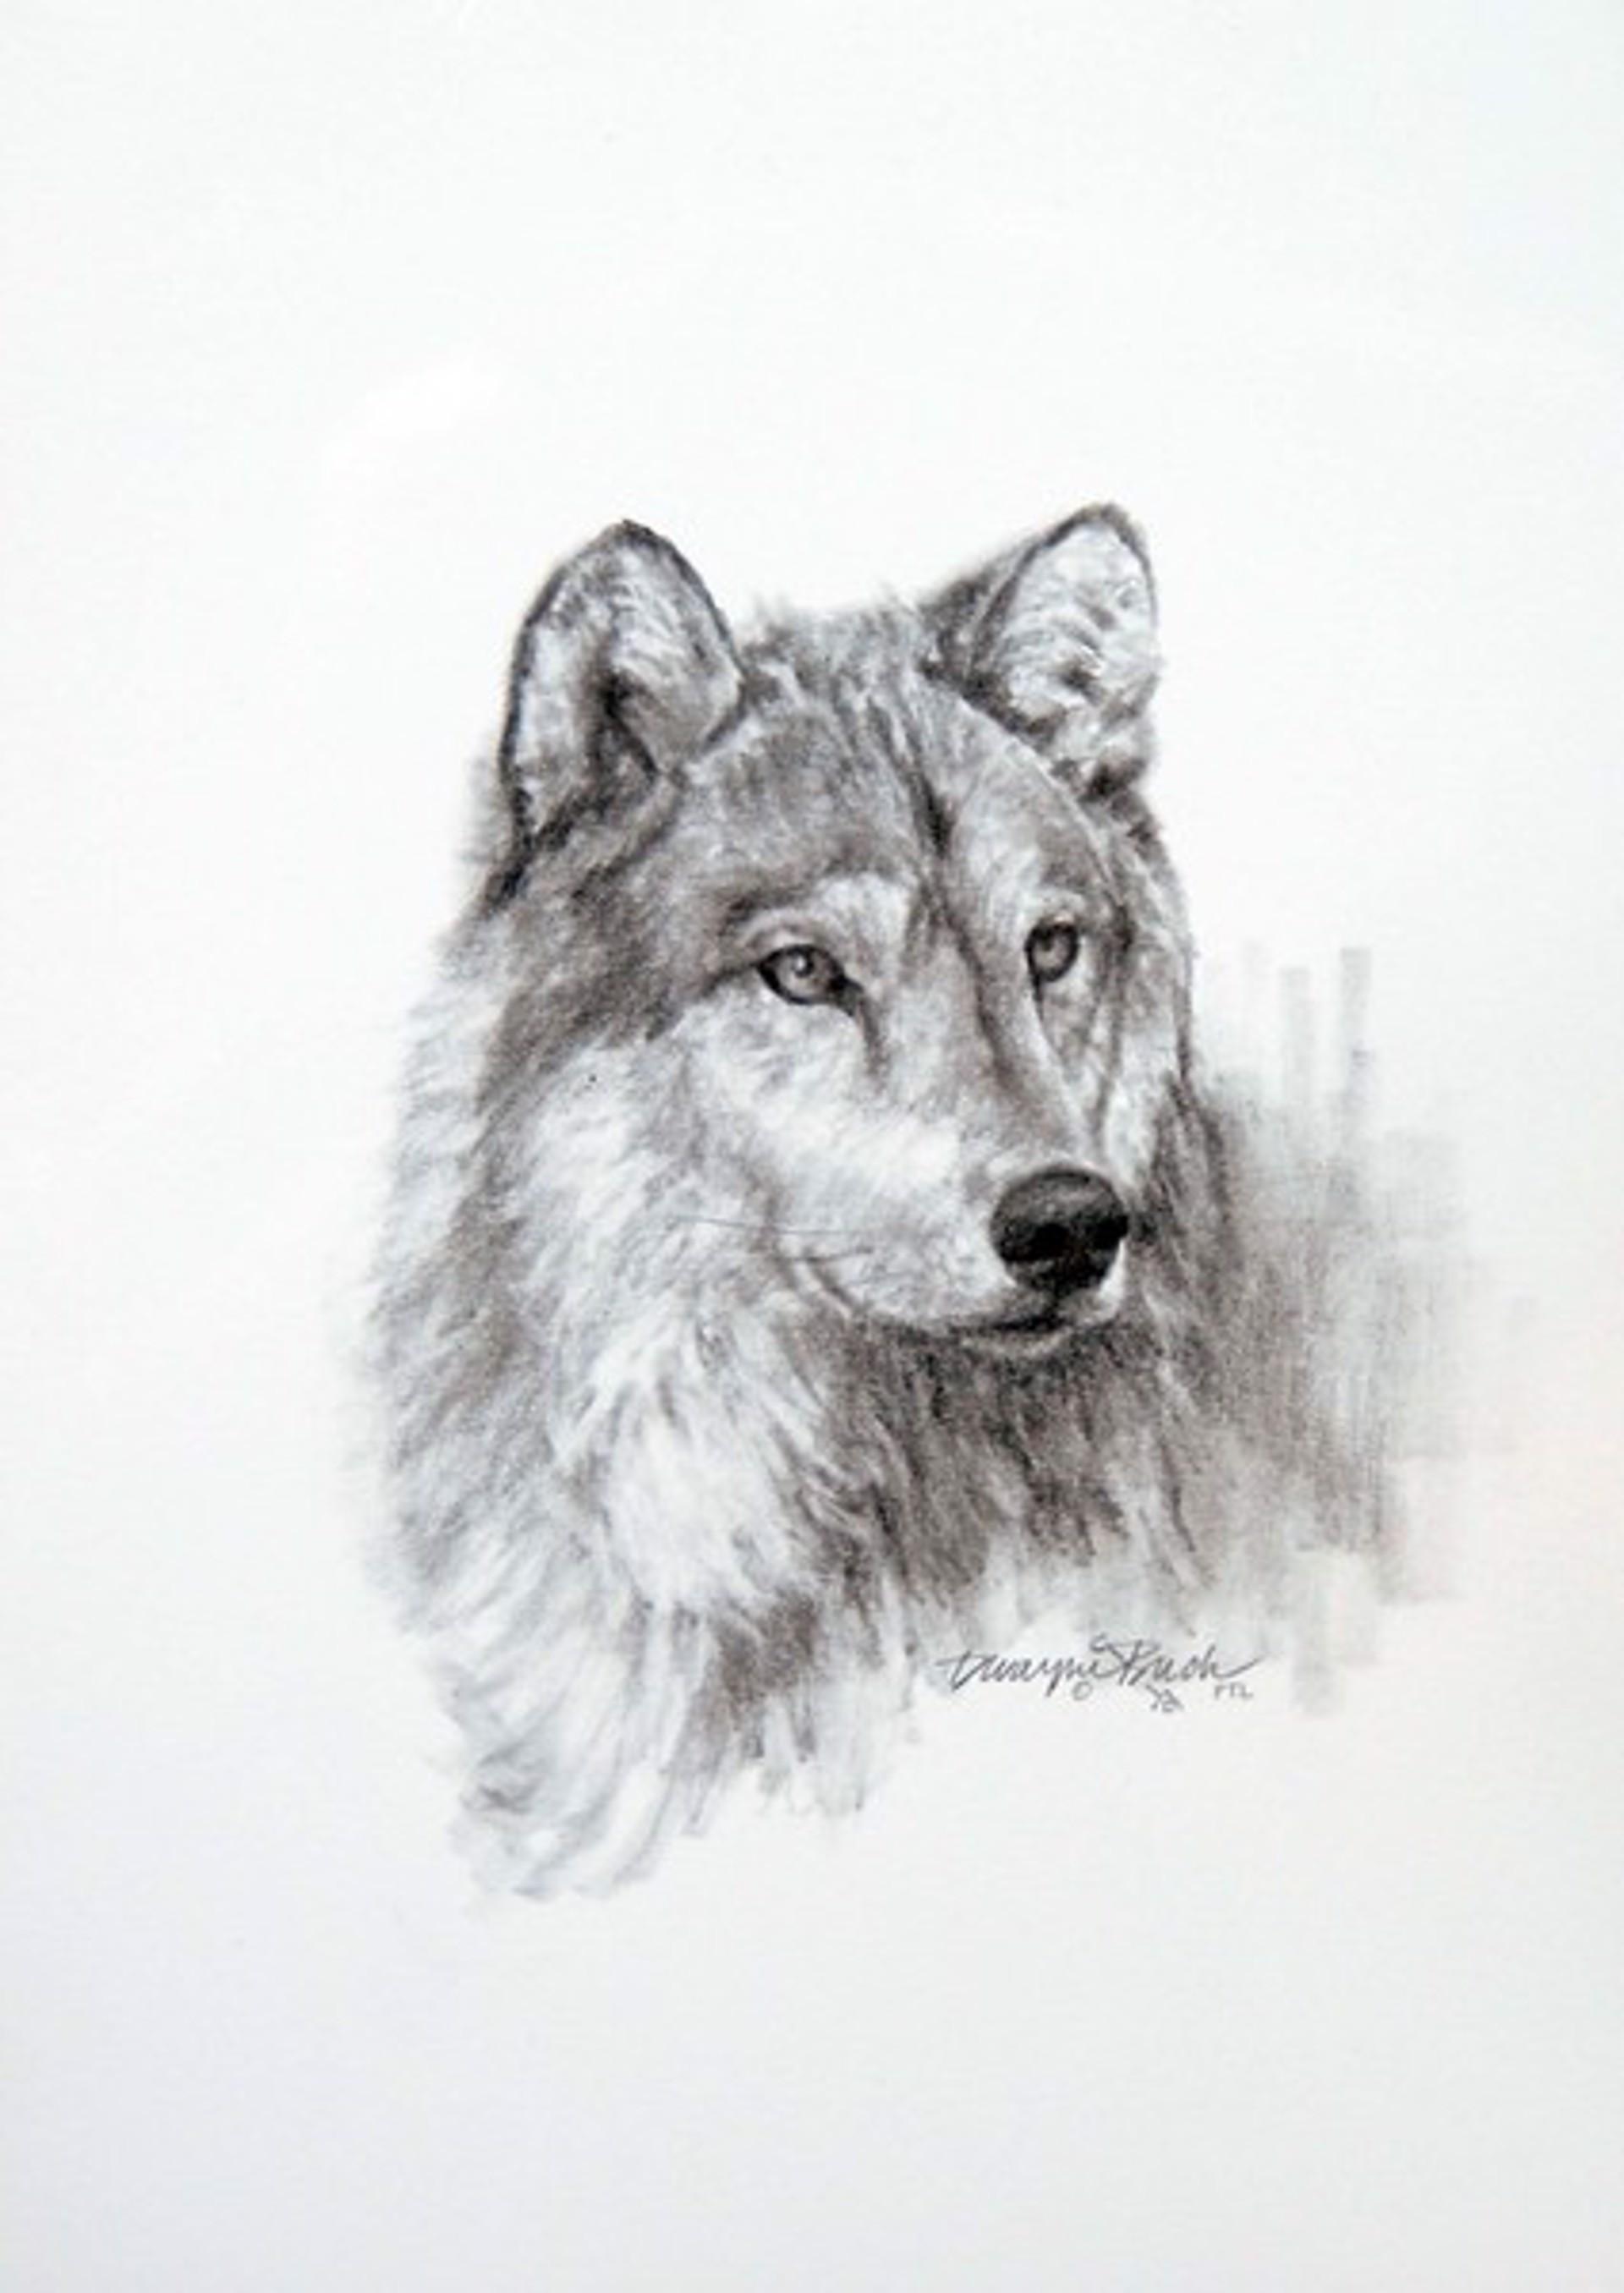 Wolf by Dwayne Brech